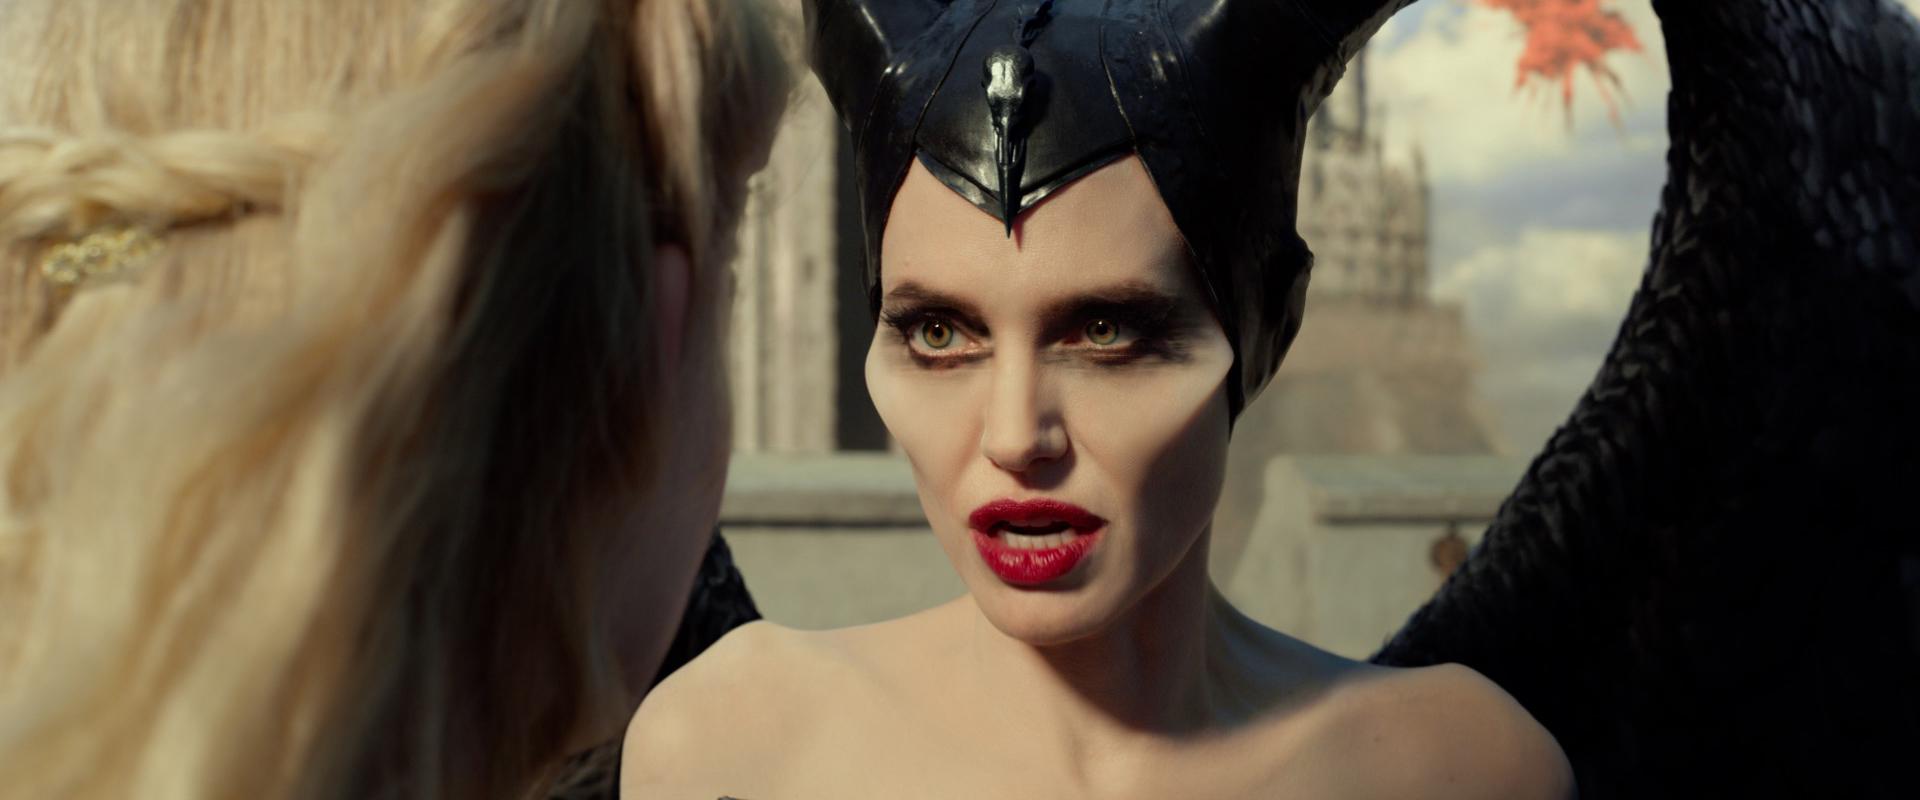 New Trailer For Maleficent Mistress Of Evil Starring